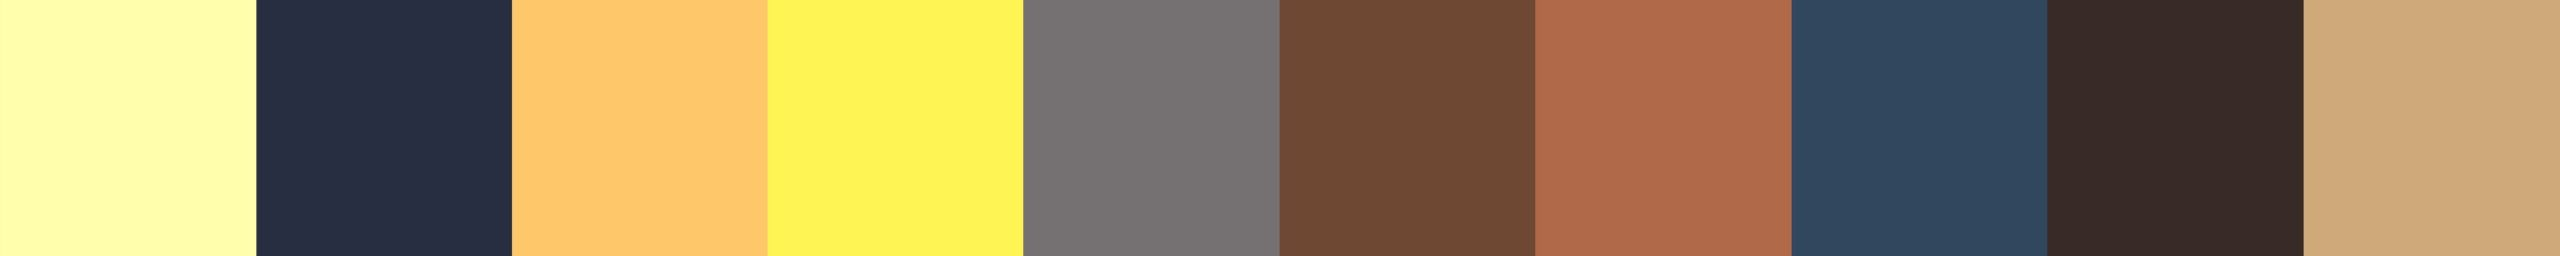 224 Vervegia Color Palette